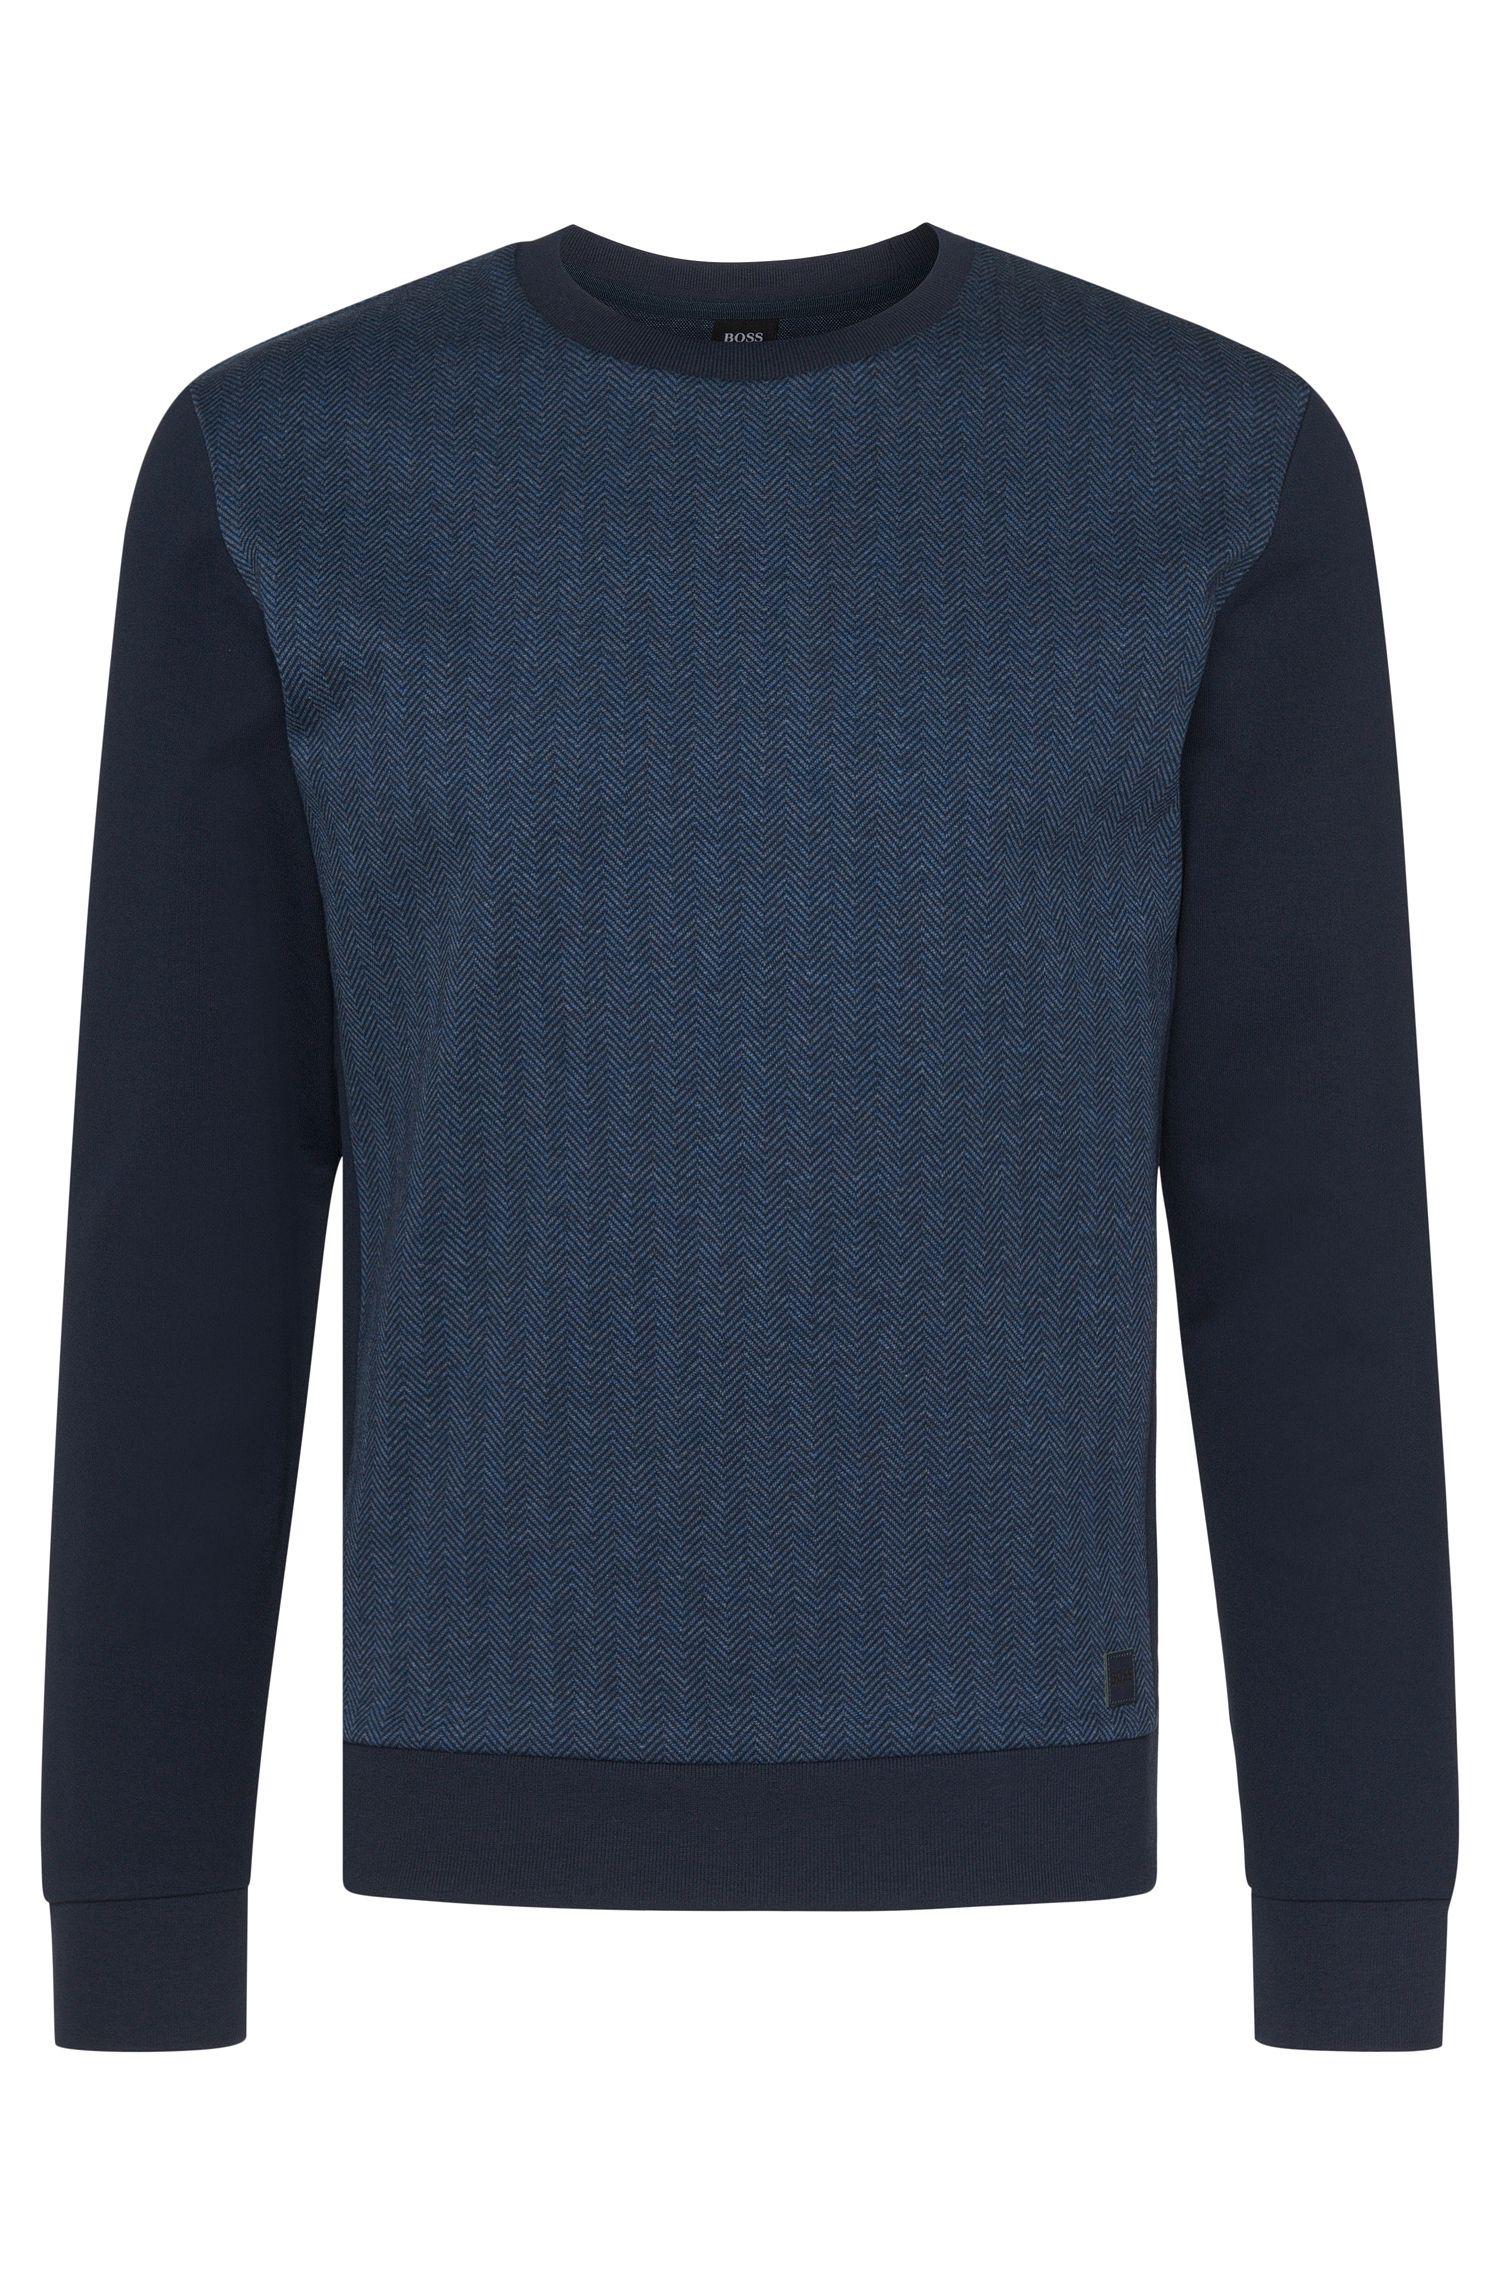 Cotton Herringbone Print Sweatshirt   Sweatshirt